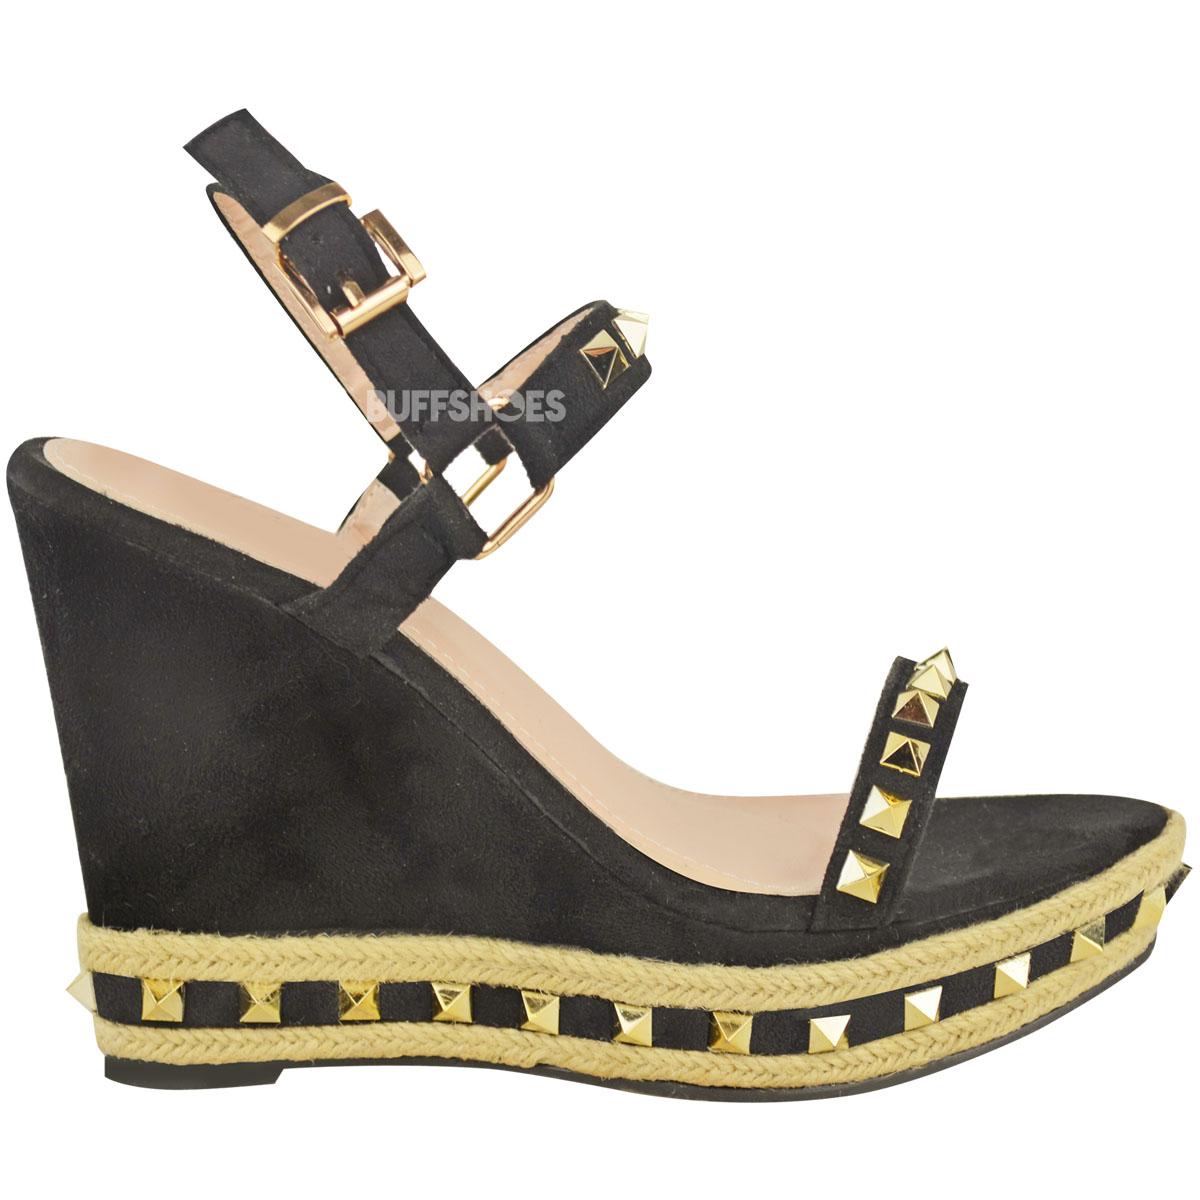 Womens Ladies Studded Espadrille Wedge High Heel Sandals